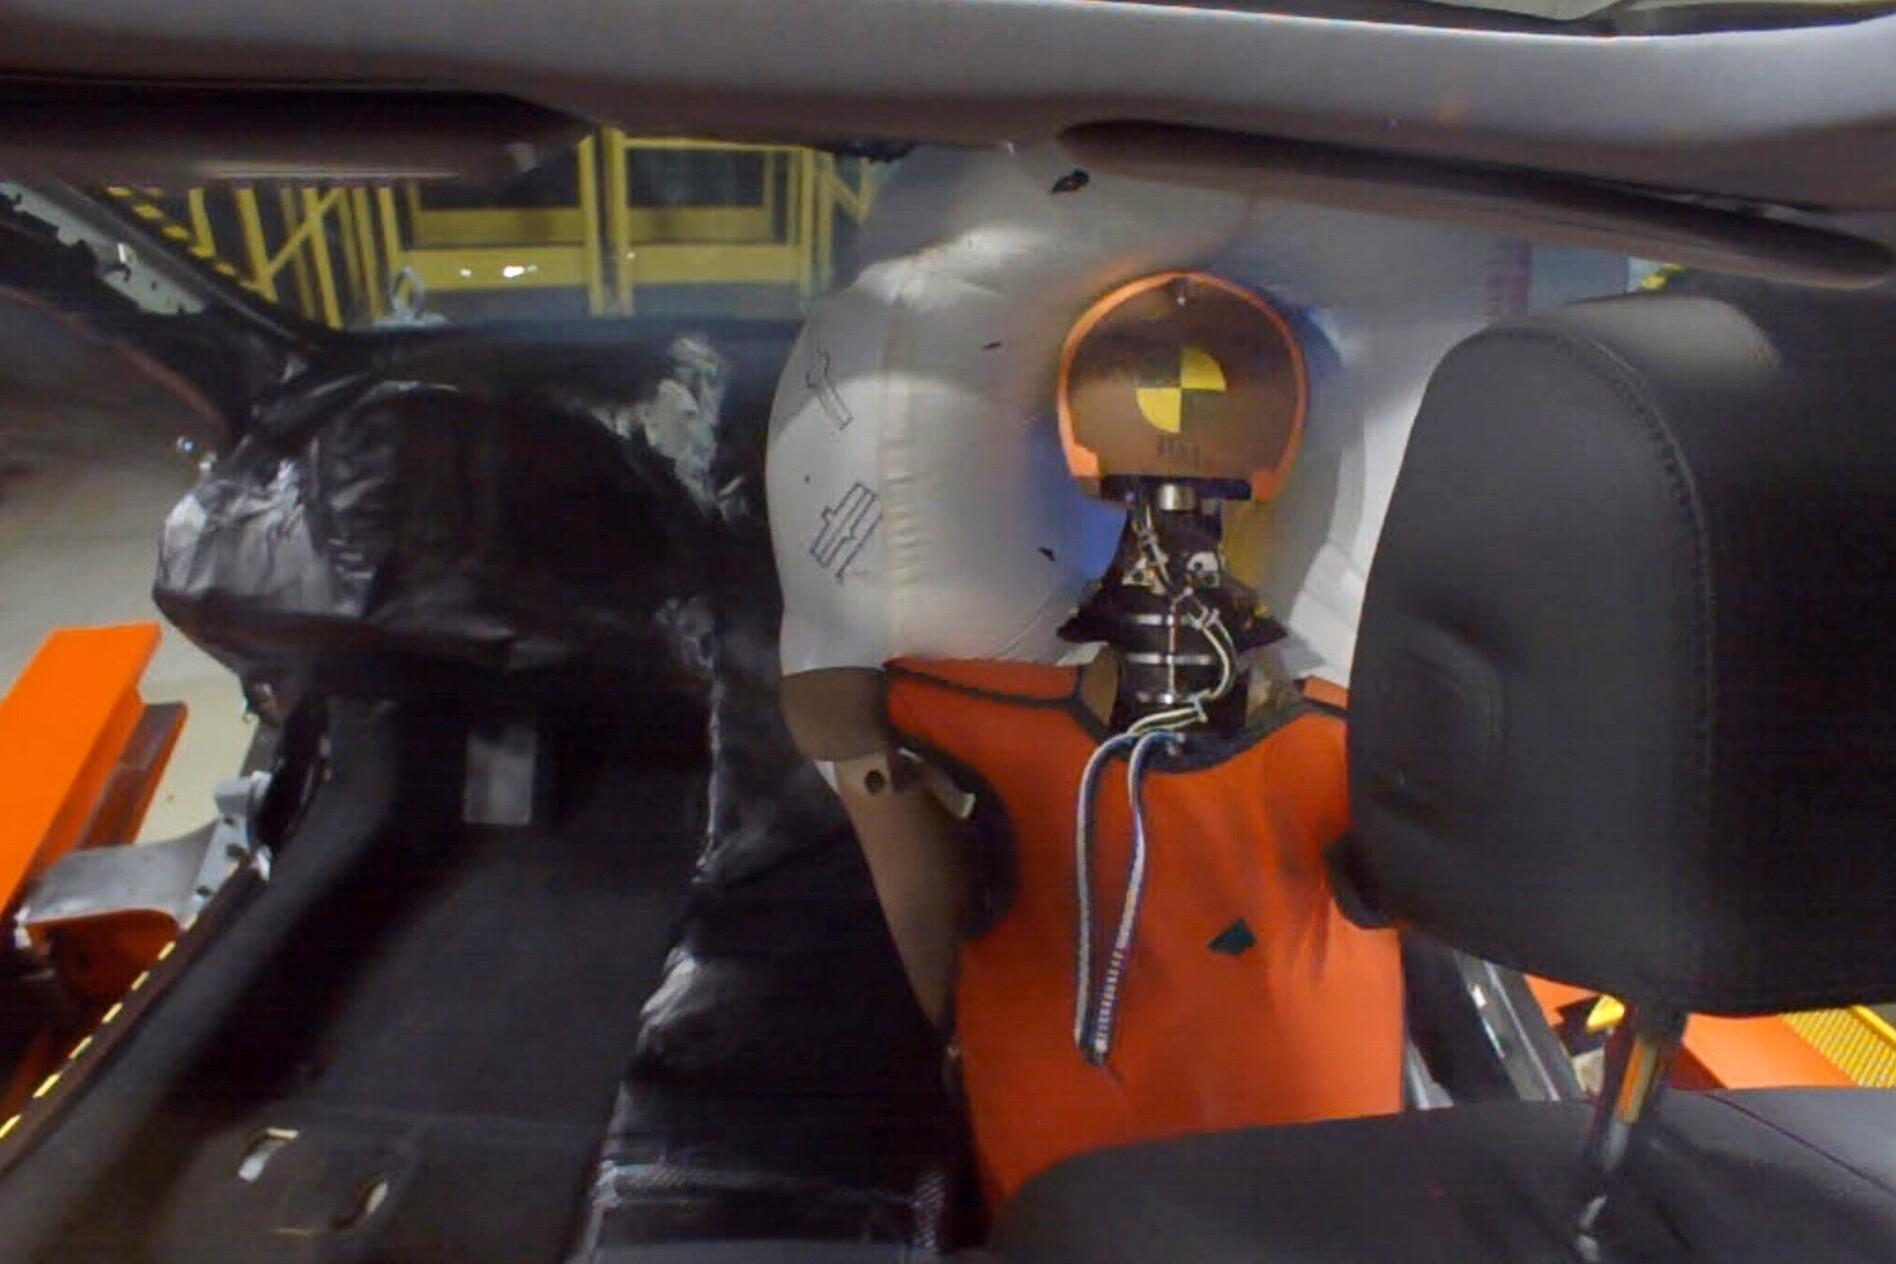 Honda new airbag